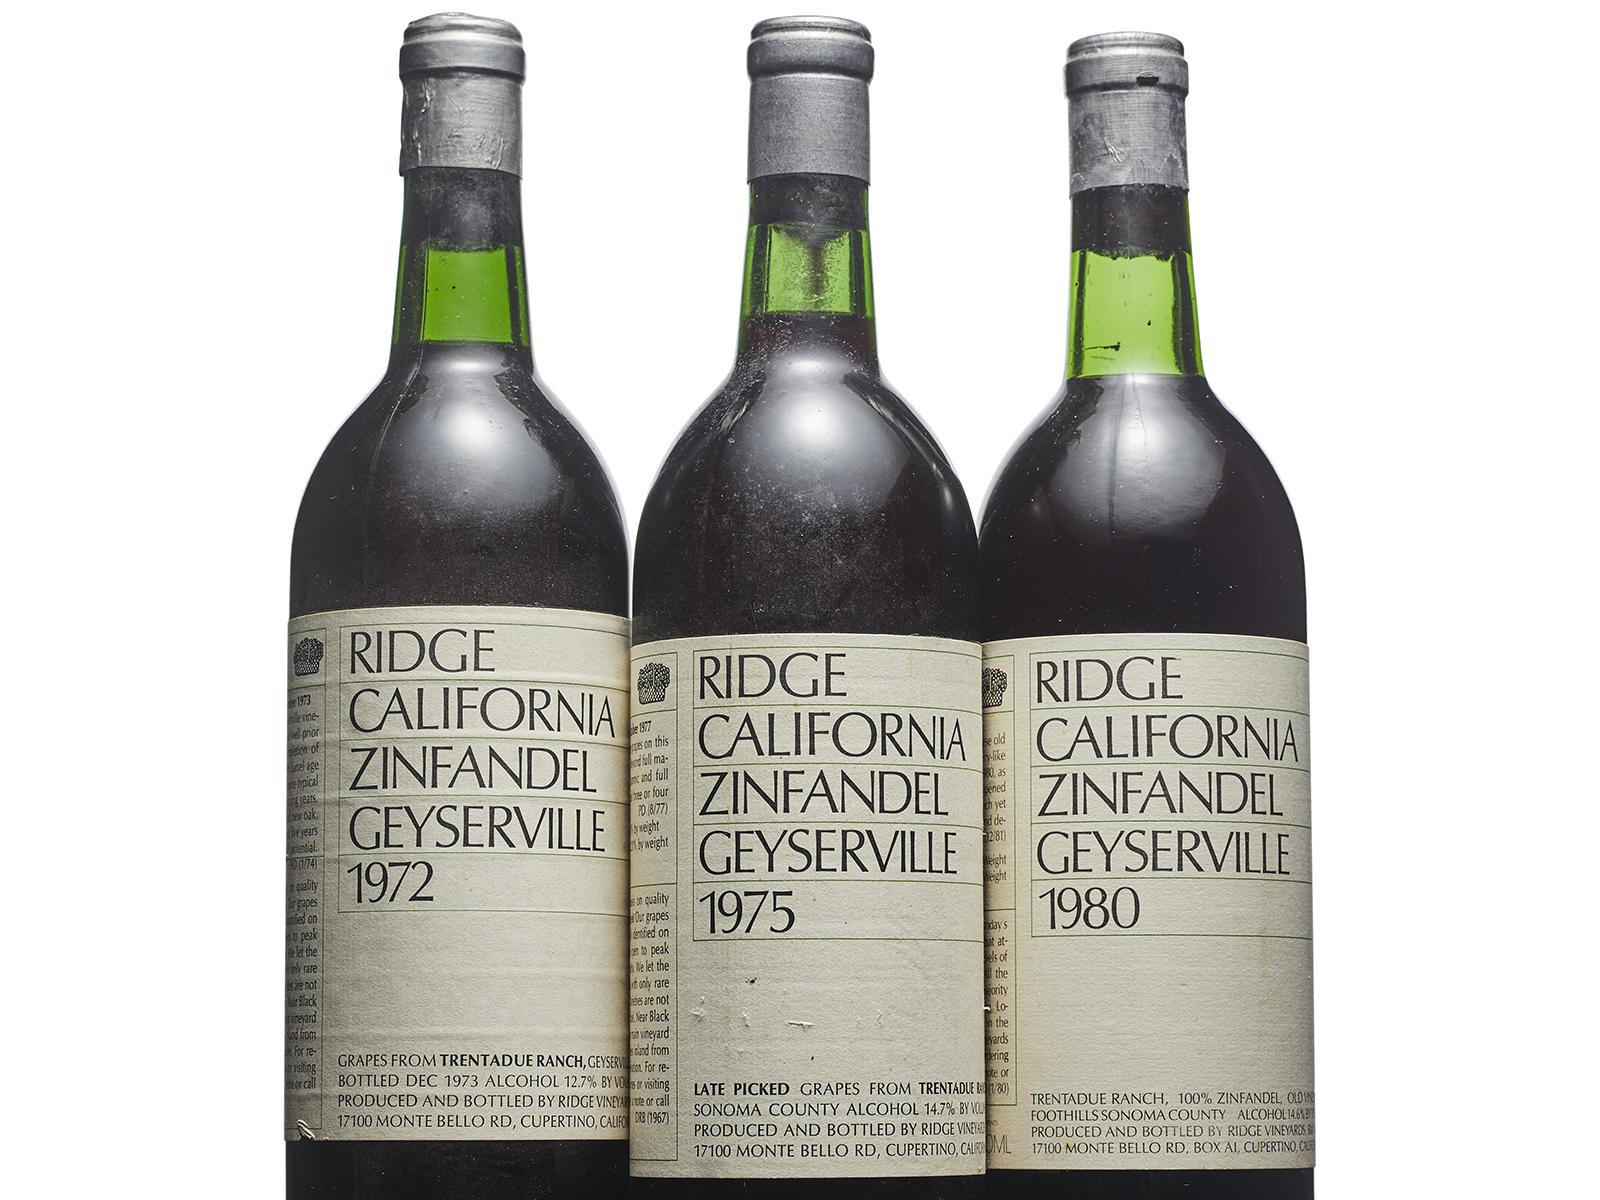 Three bottles of Ridge Vineyards Zinfandel